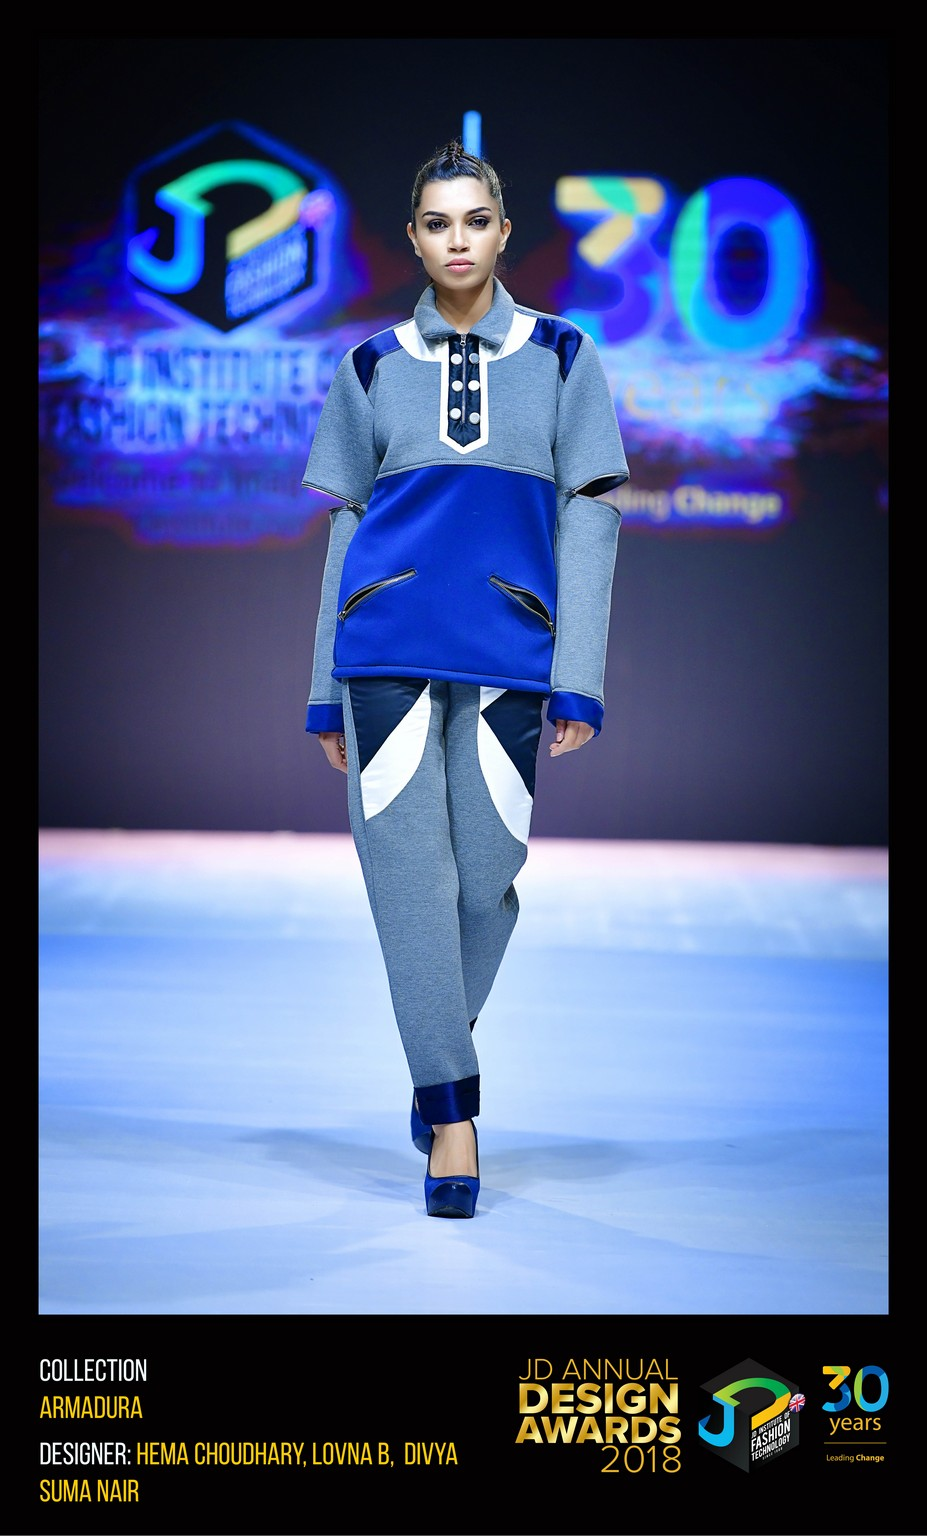 Armadura Collection – Change – JD Annual Design Awards 2018   Designer: Hema, Lovna, Divya   Photography : Jerin Nath (@jerin_nath) armadura collection - ARMADURA3 - Armadura Collection – Change – JD Annual Design Awards 2018